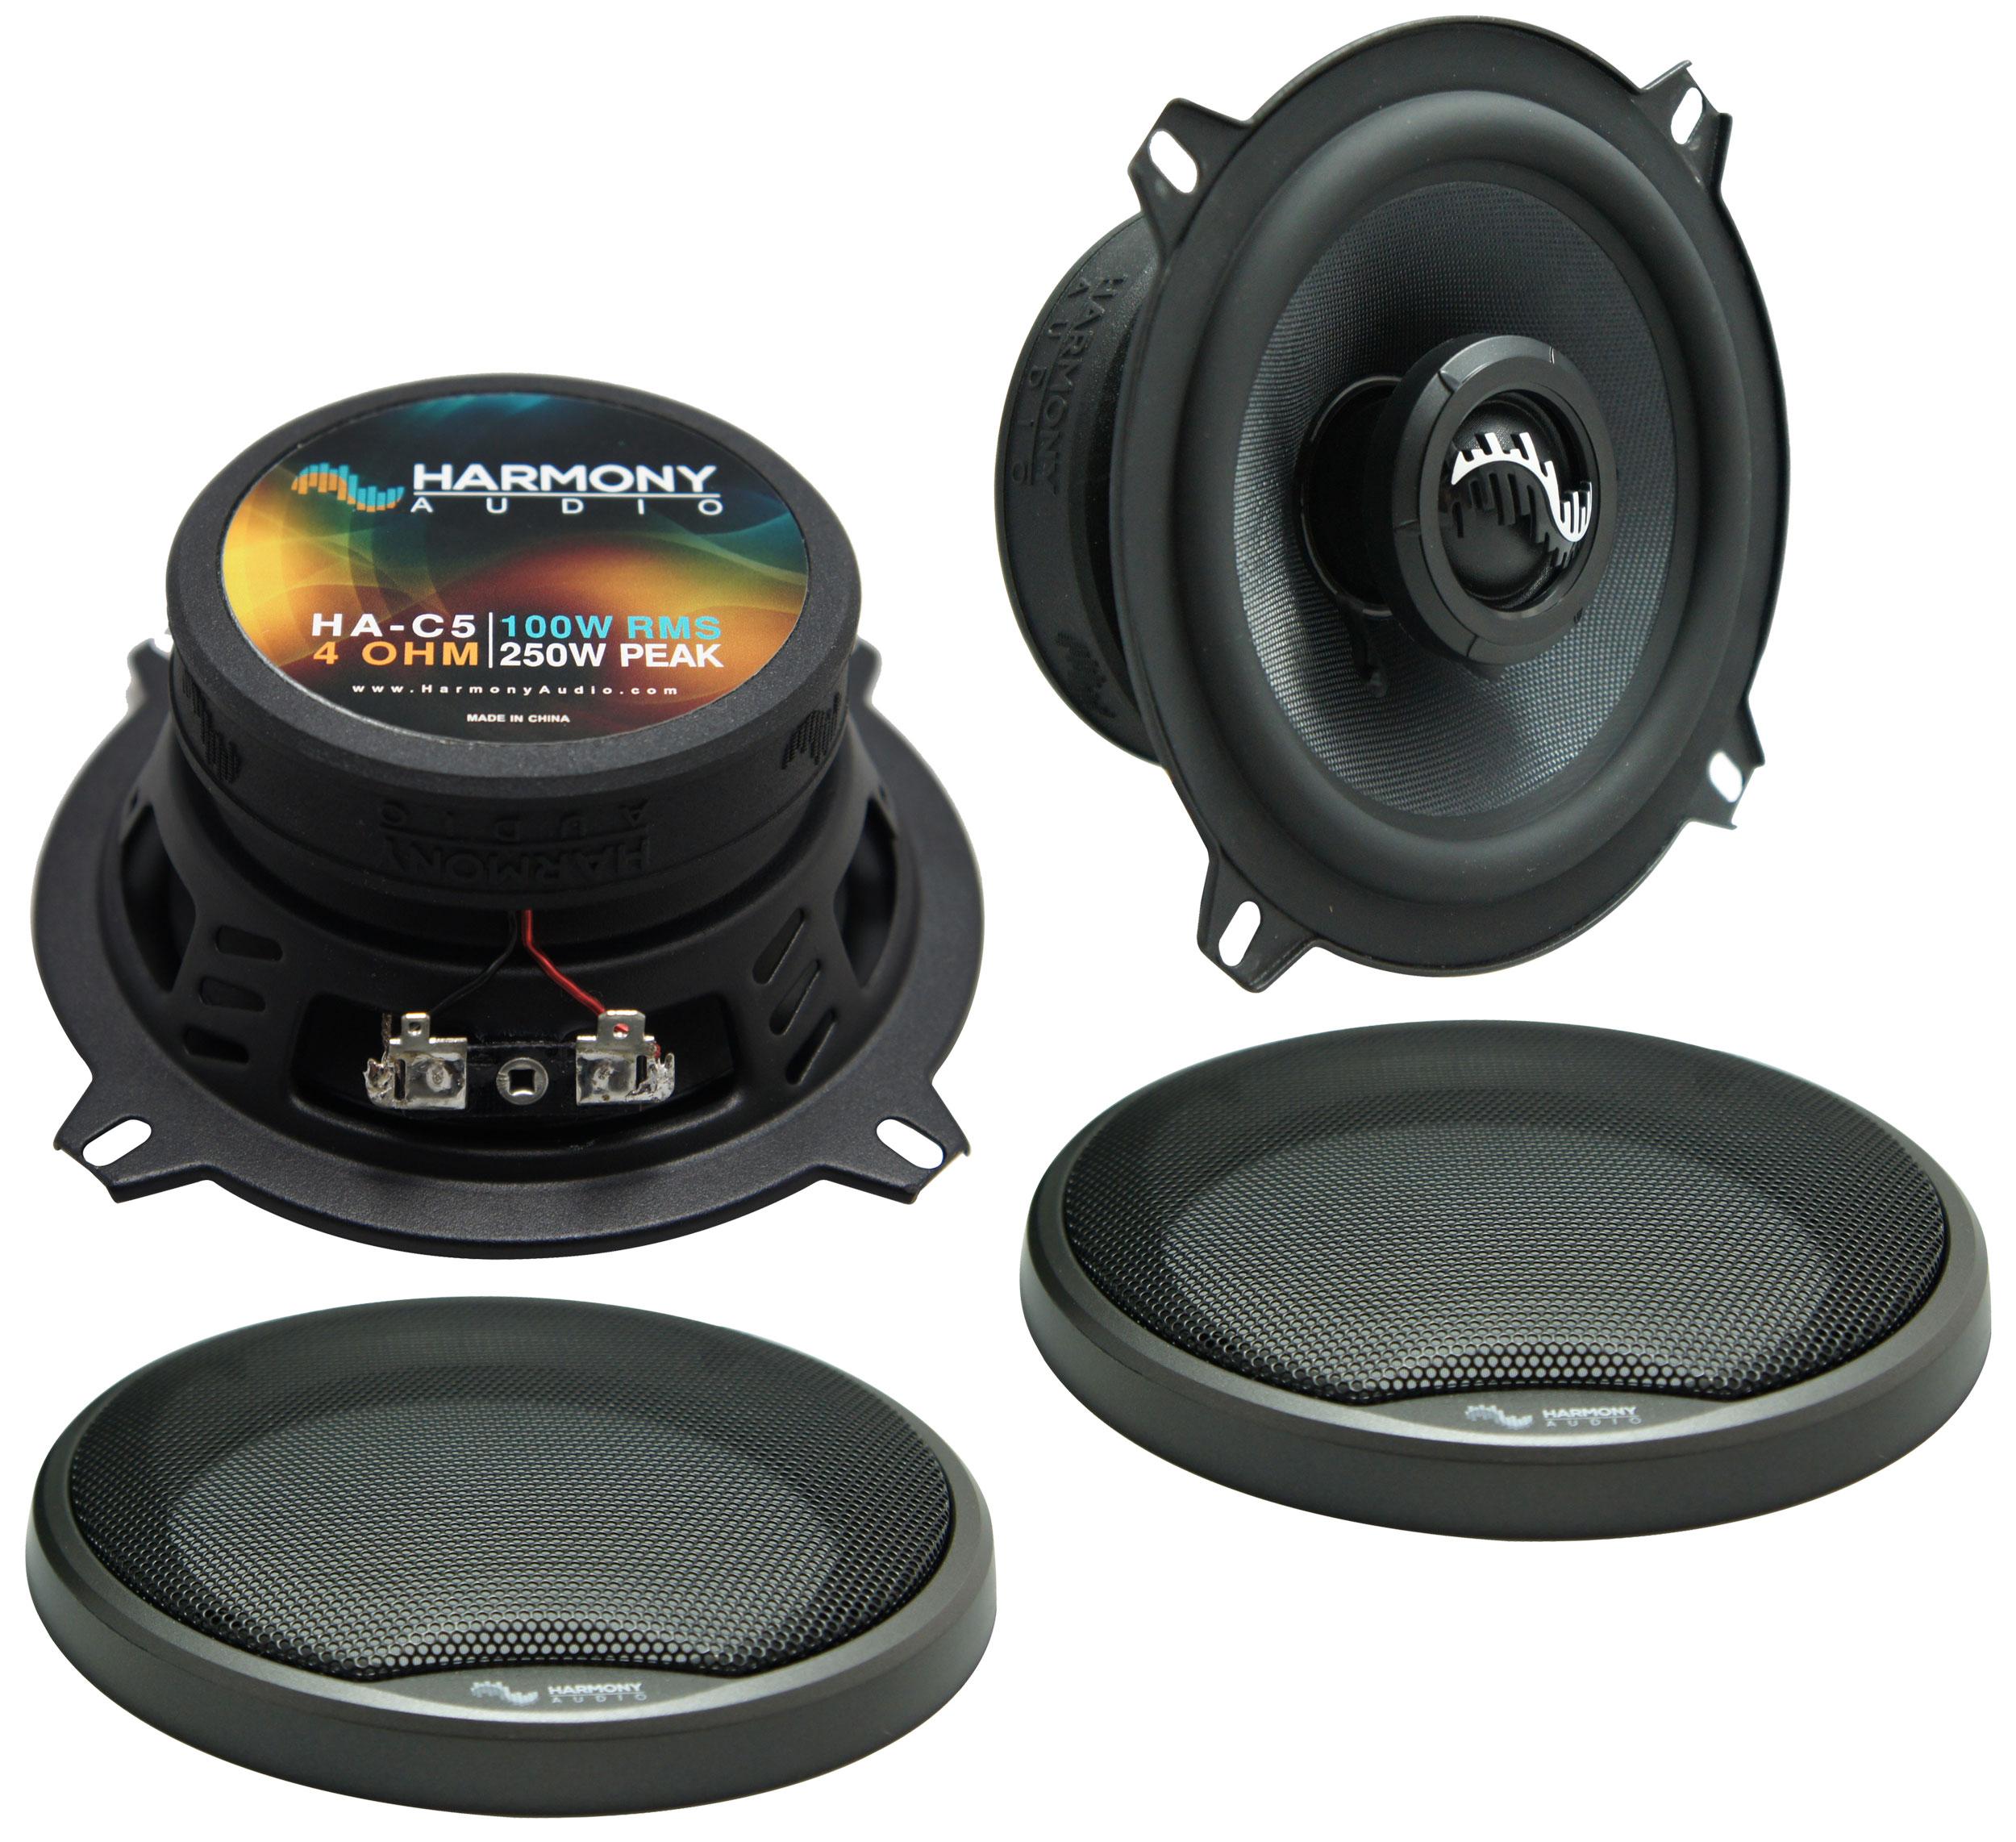 Fits Dodge Ram Truck 1500 1994-2001 Rear Replacement Harmony HA-C5 Premium Speakers New